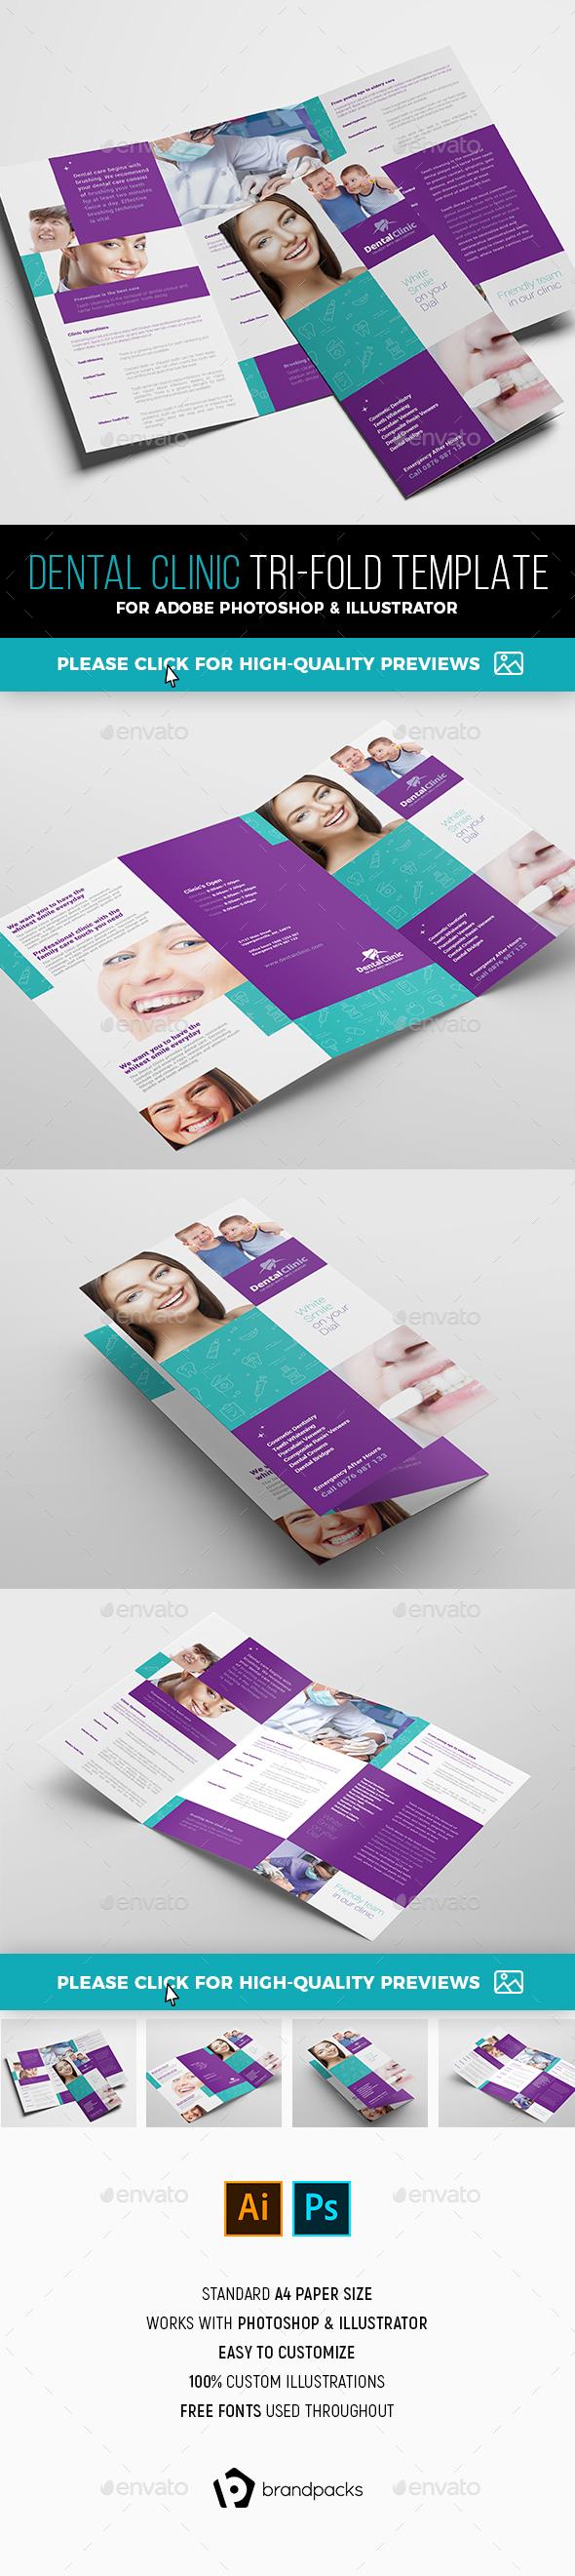 Dental Clinic Tri-Fold Brochure Template - Corporate Brochures